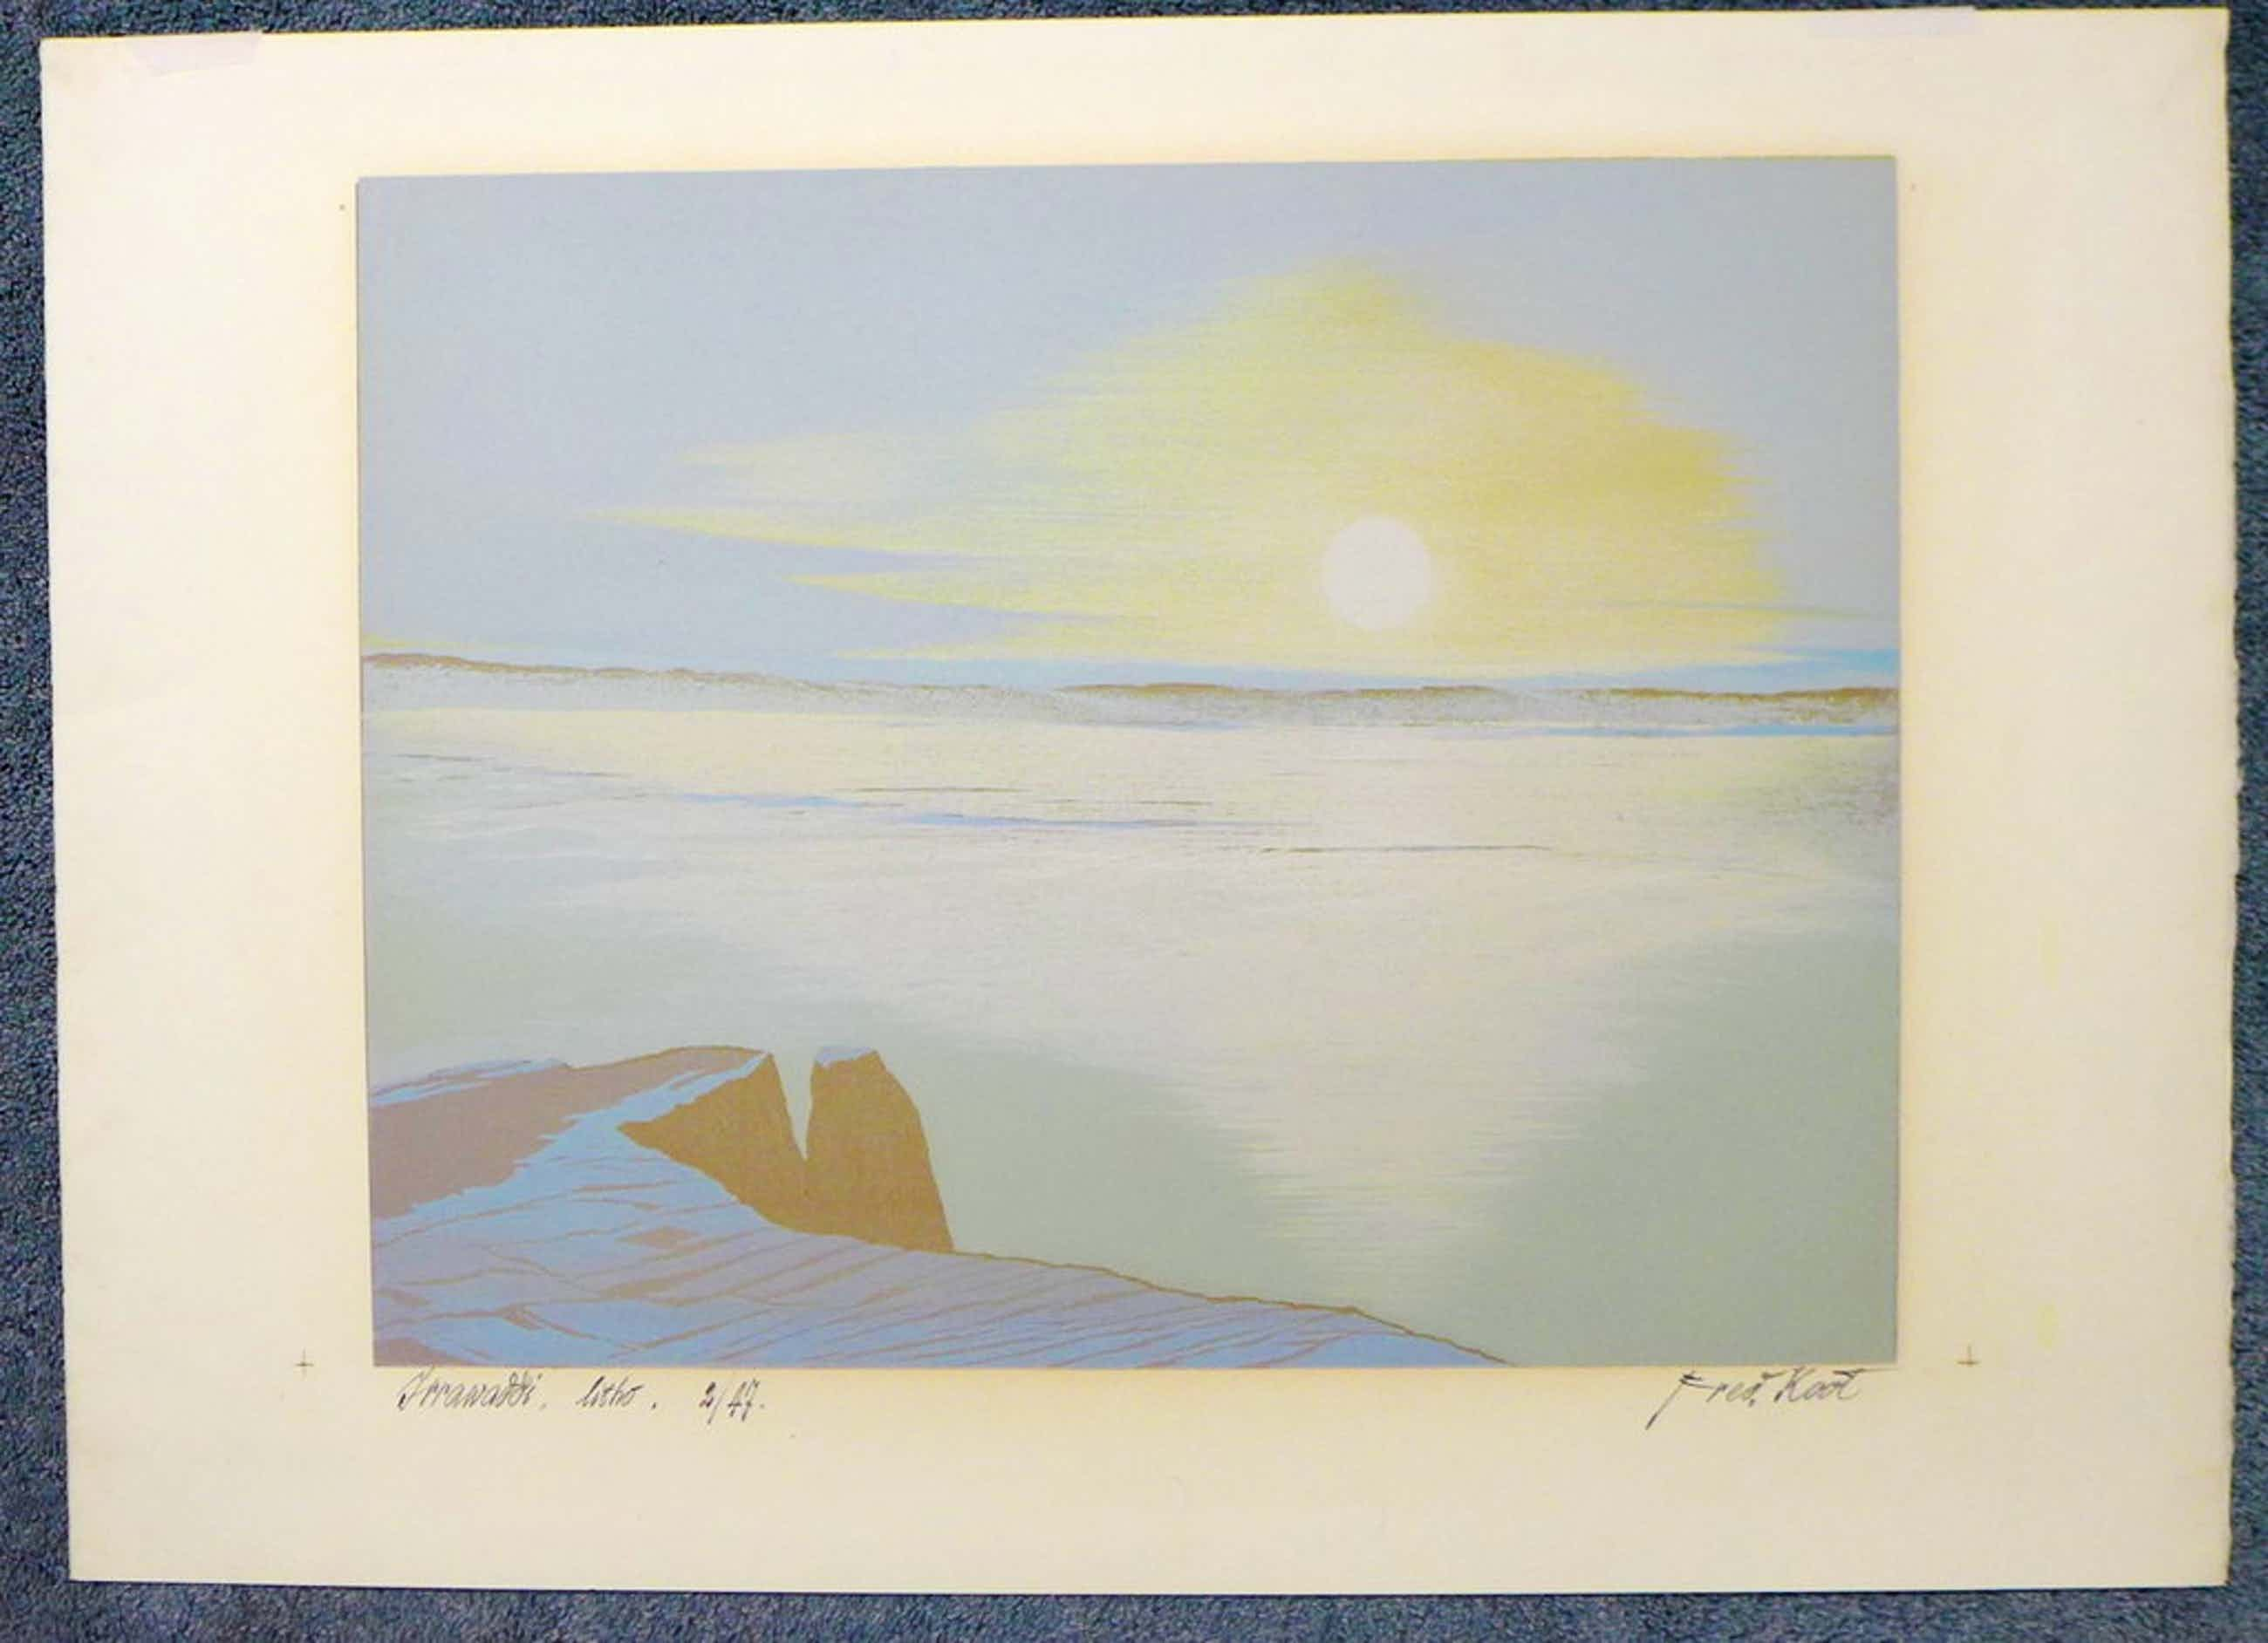 Fred Koot - Fred Koot, litho, titel Jrrawaddi. oplage 2/47 beeldformaat 35 x 44.5 cm.  kopen? Bied vanaf 45!